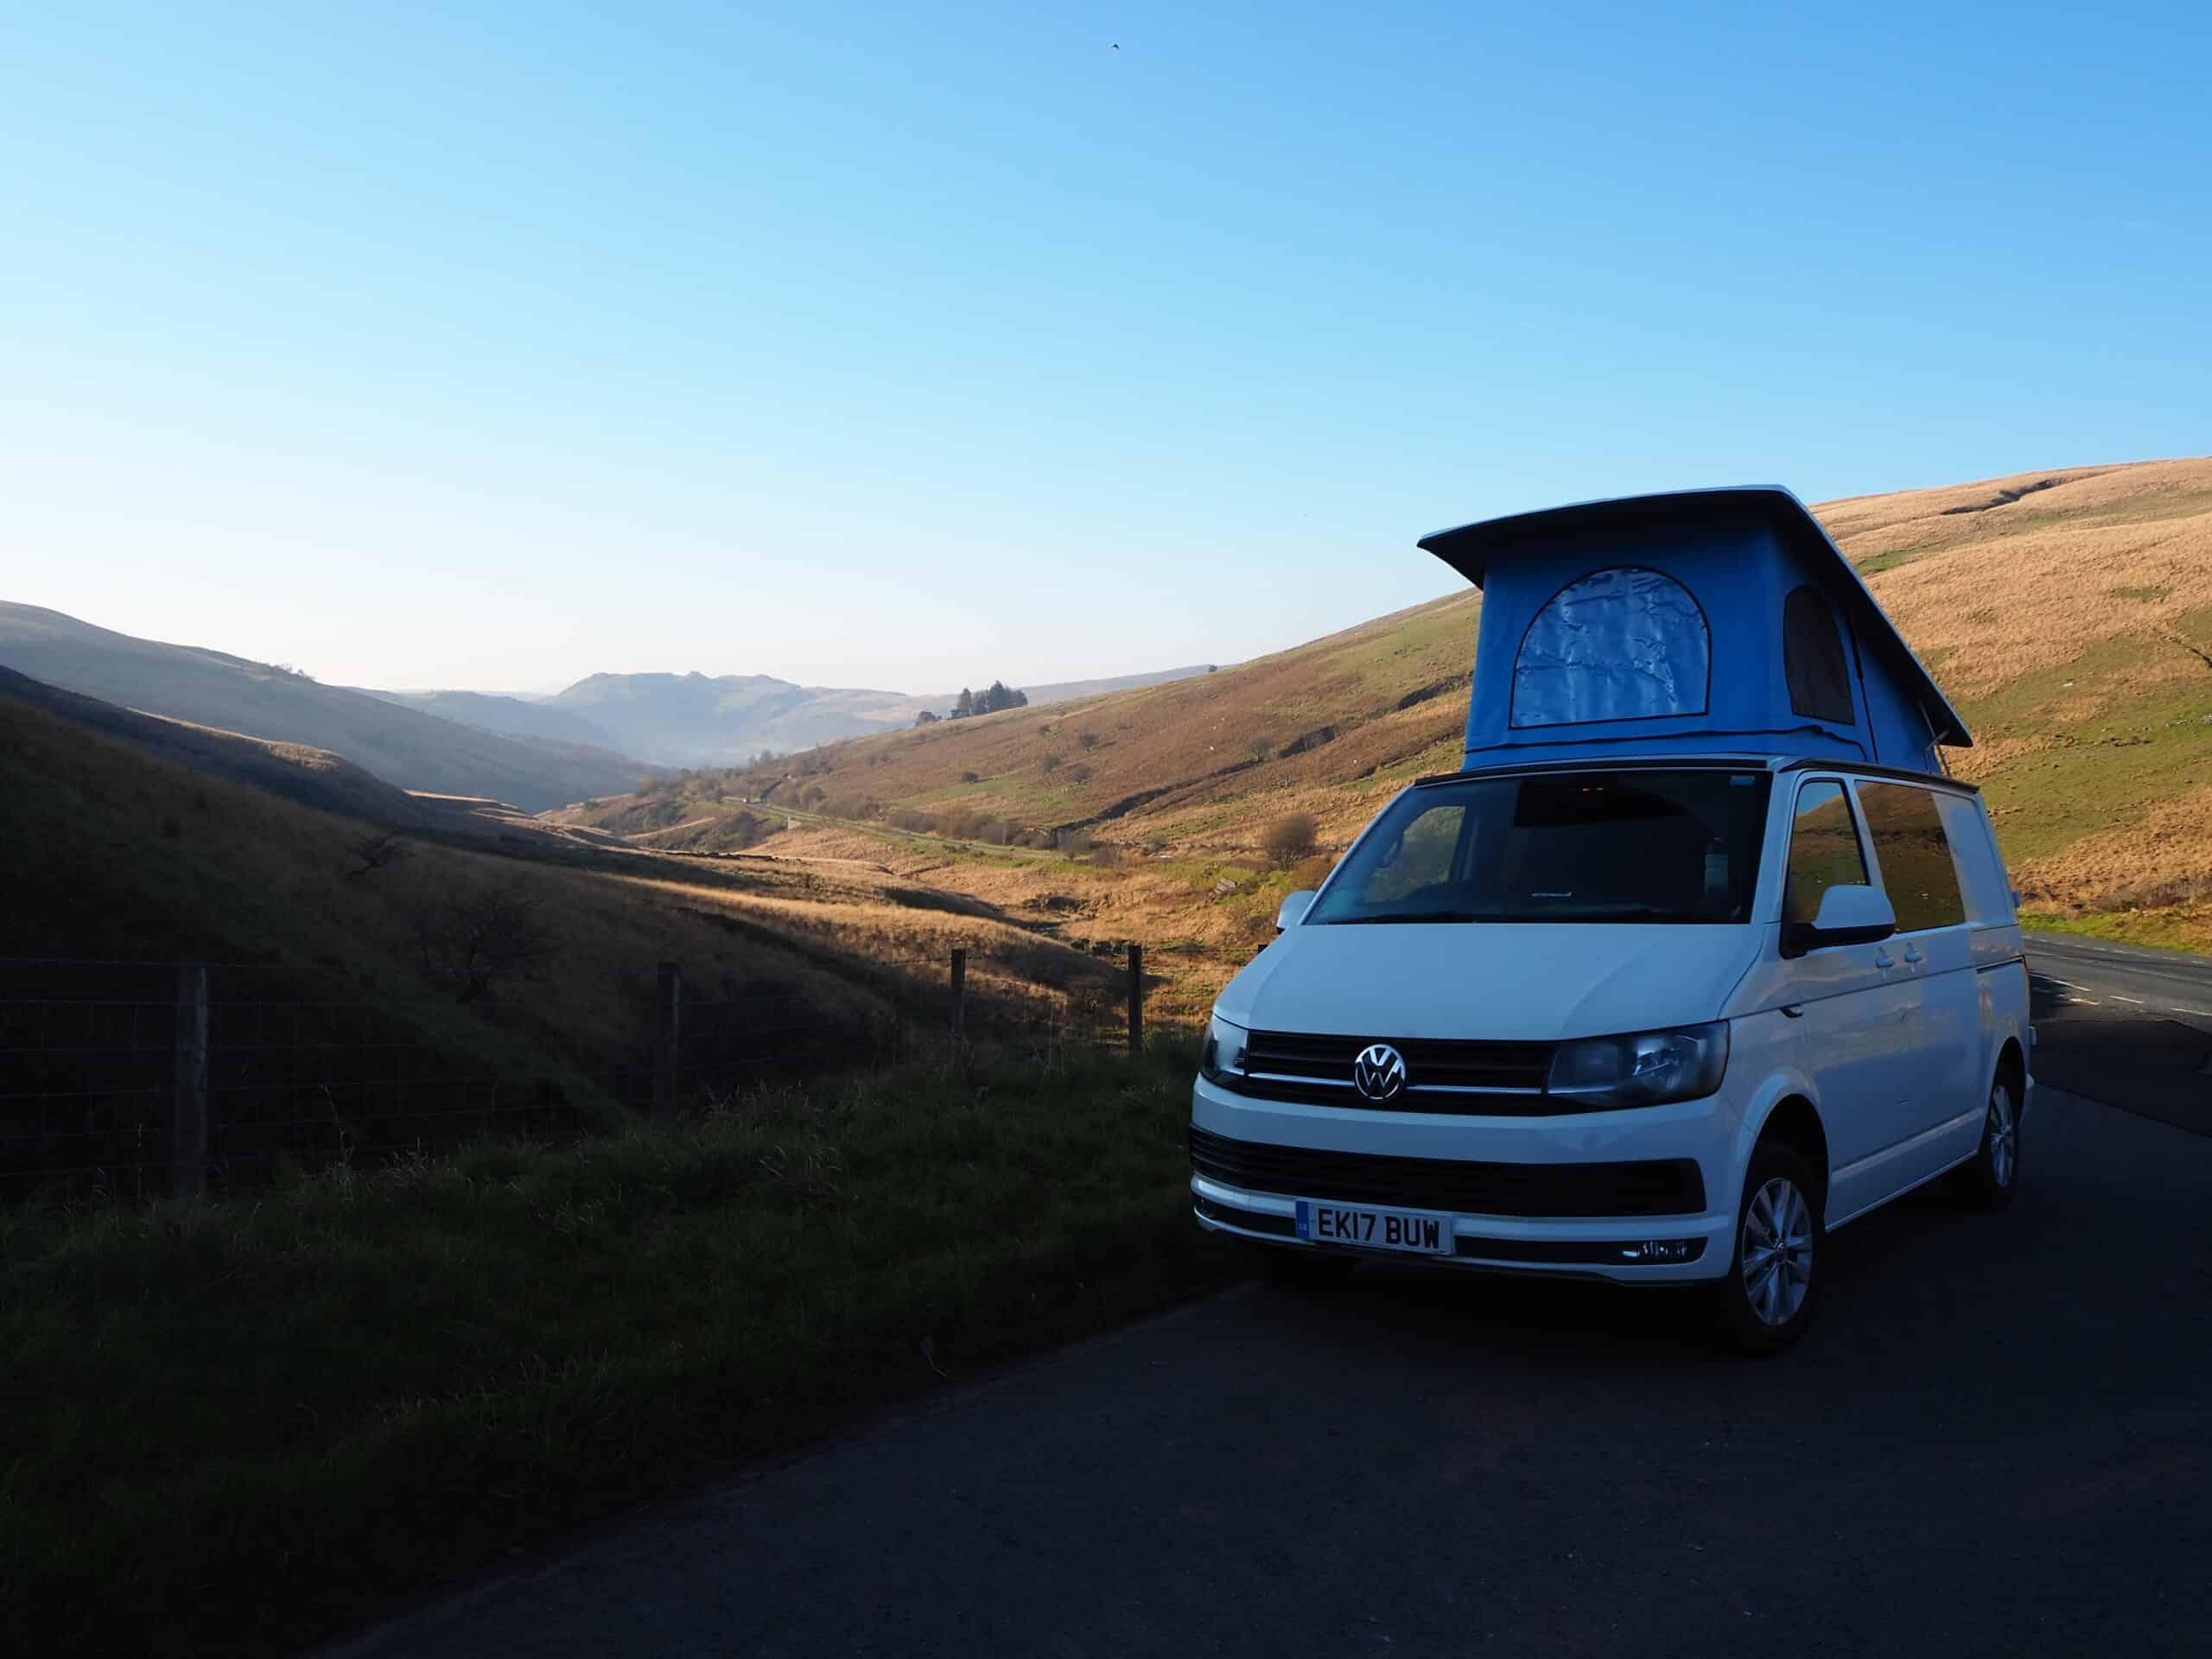 Campervan camped in Brecon Beacons